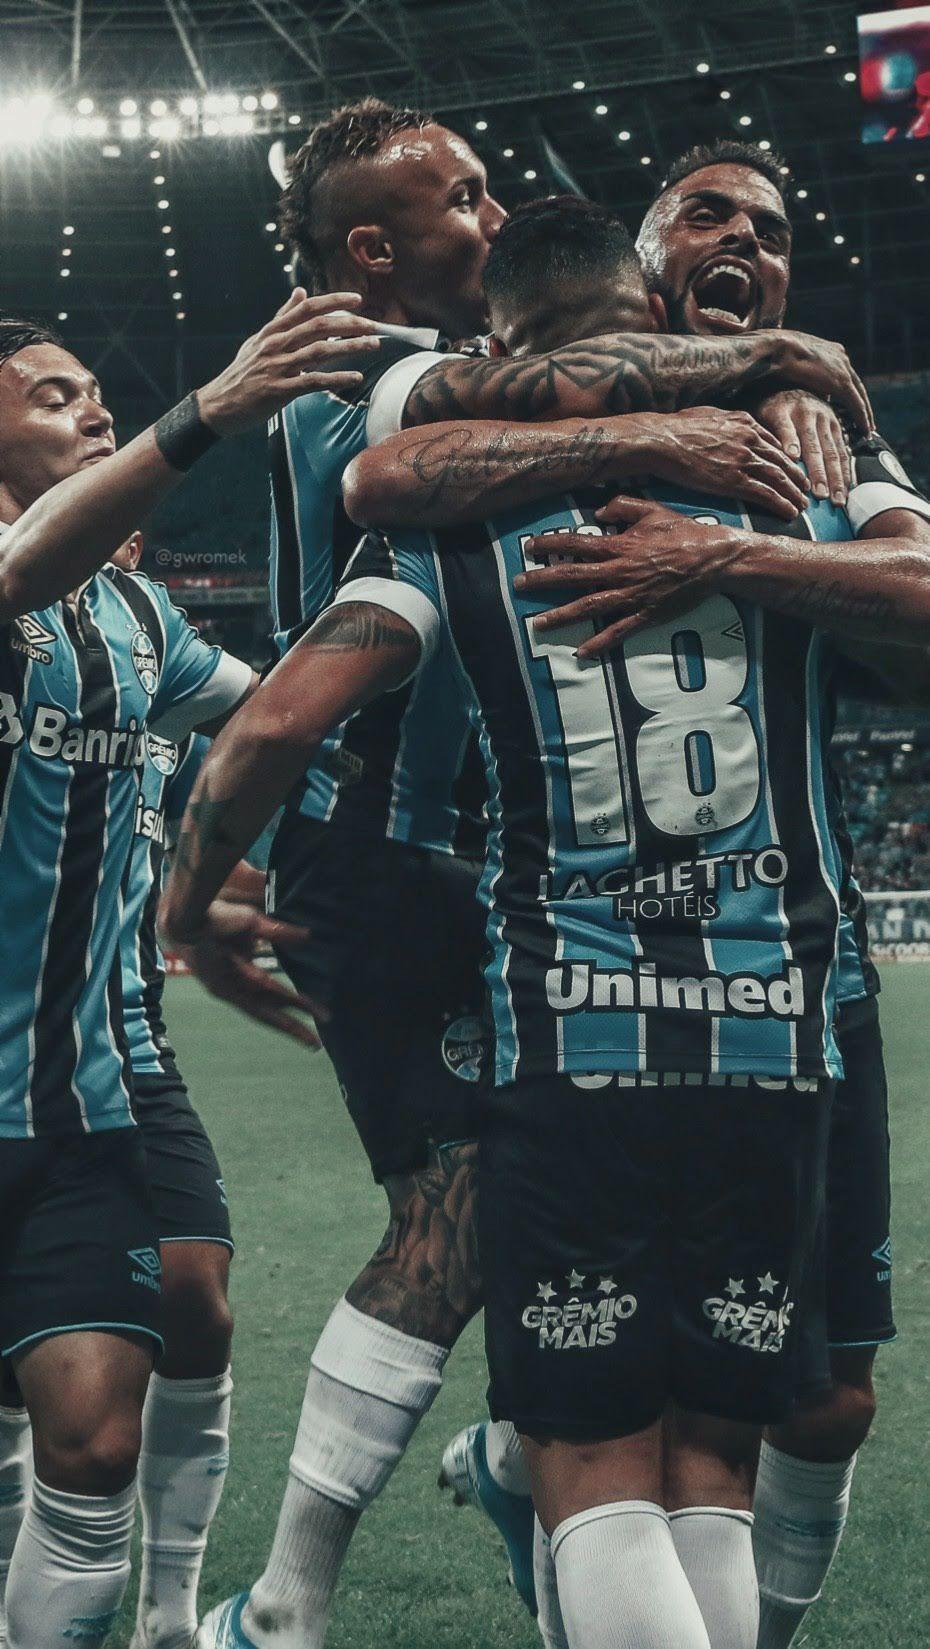 Pin De Jack Spenz Em Gremio Foot Ball Porto Alegrense Gremio Wallpaper Gremio Campeao Gaucho Libertadores Gremio